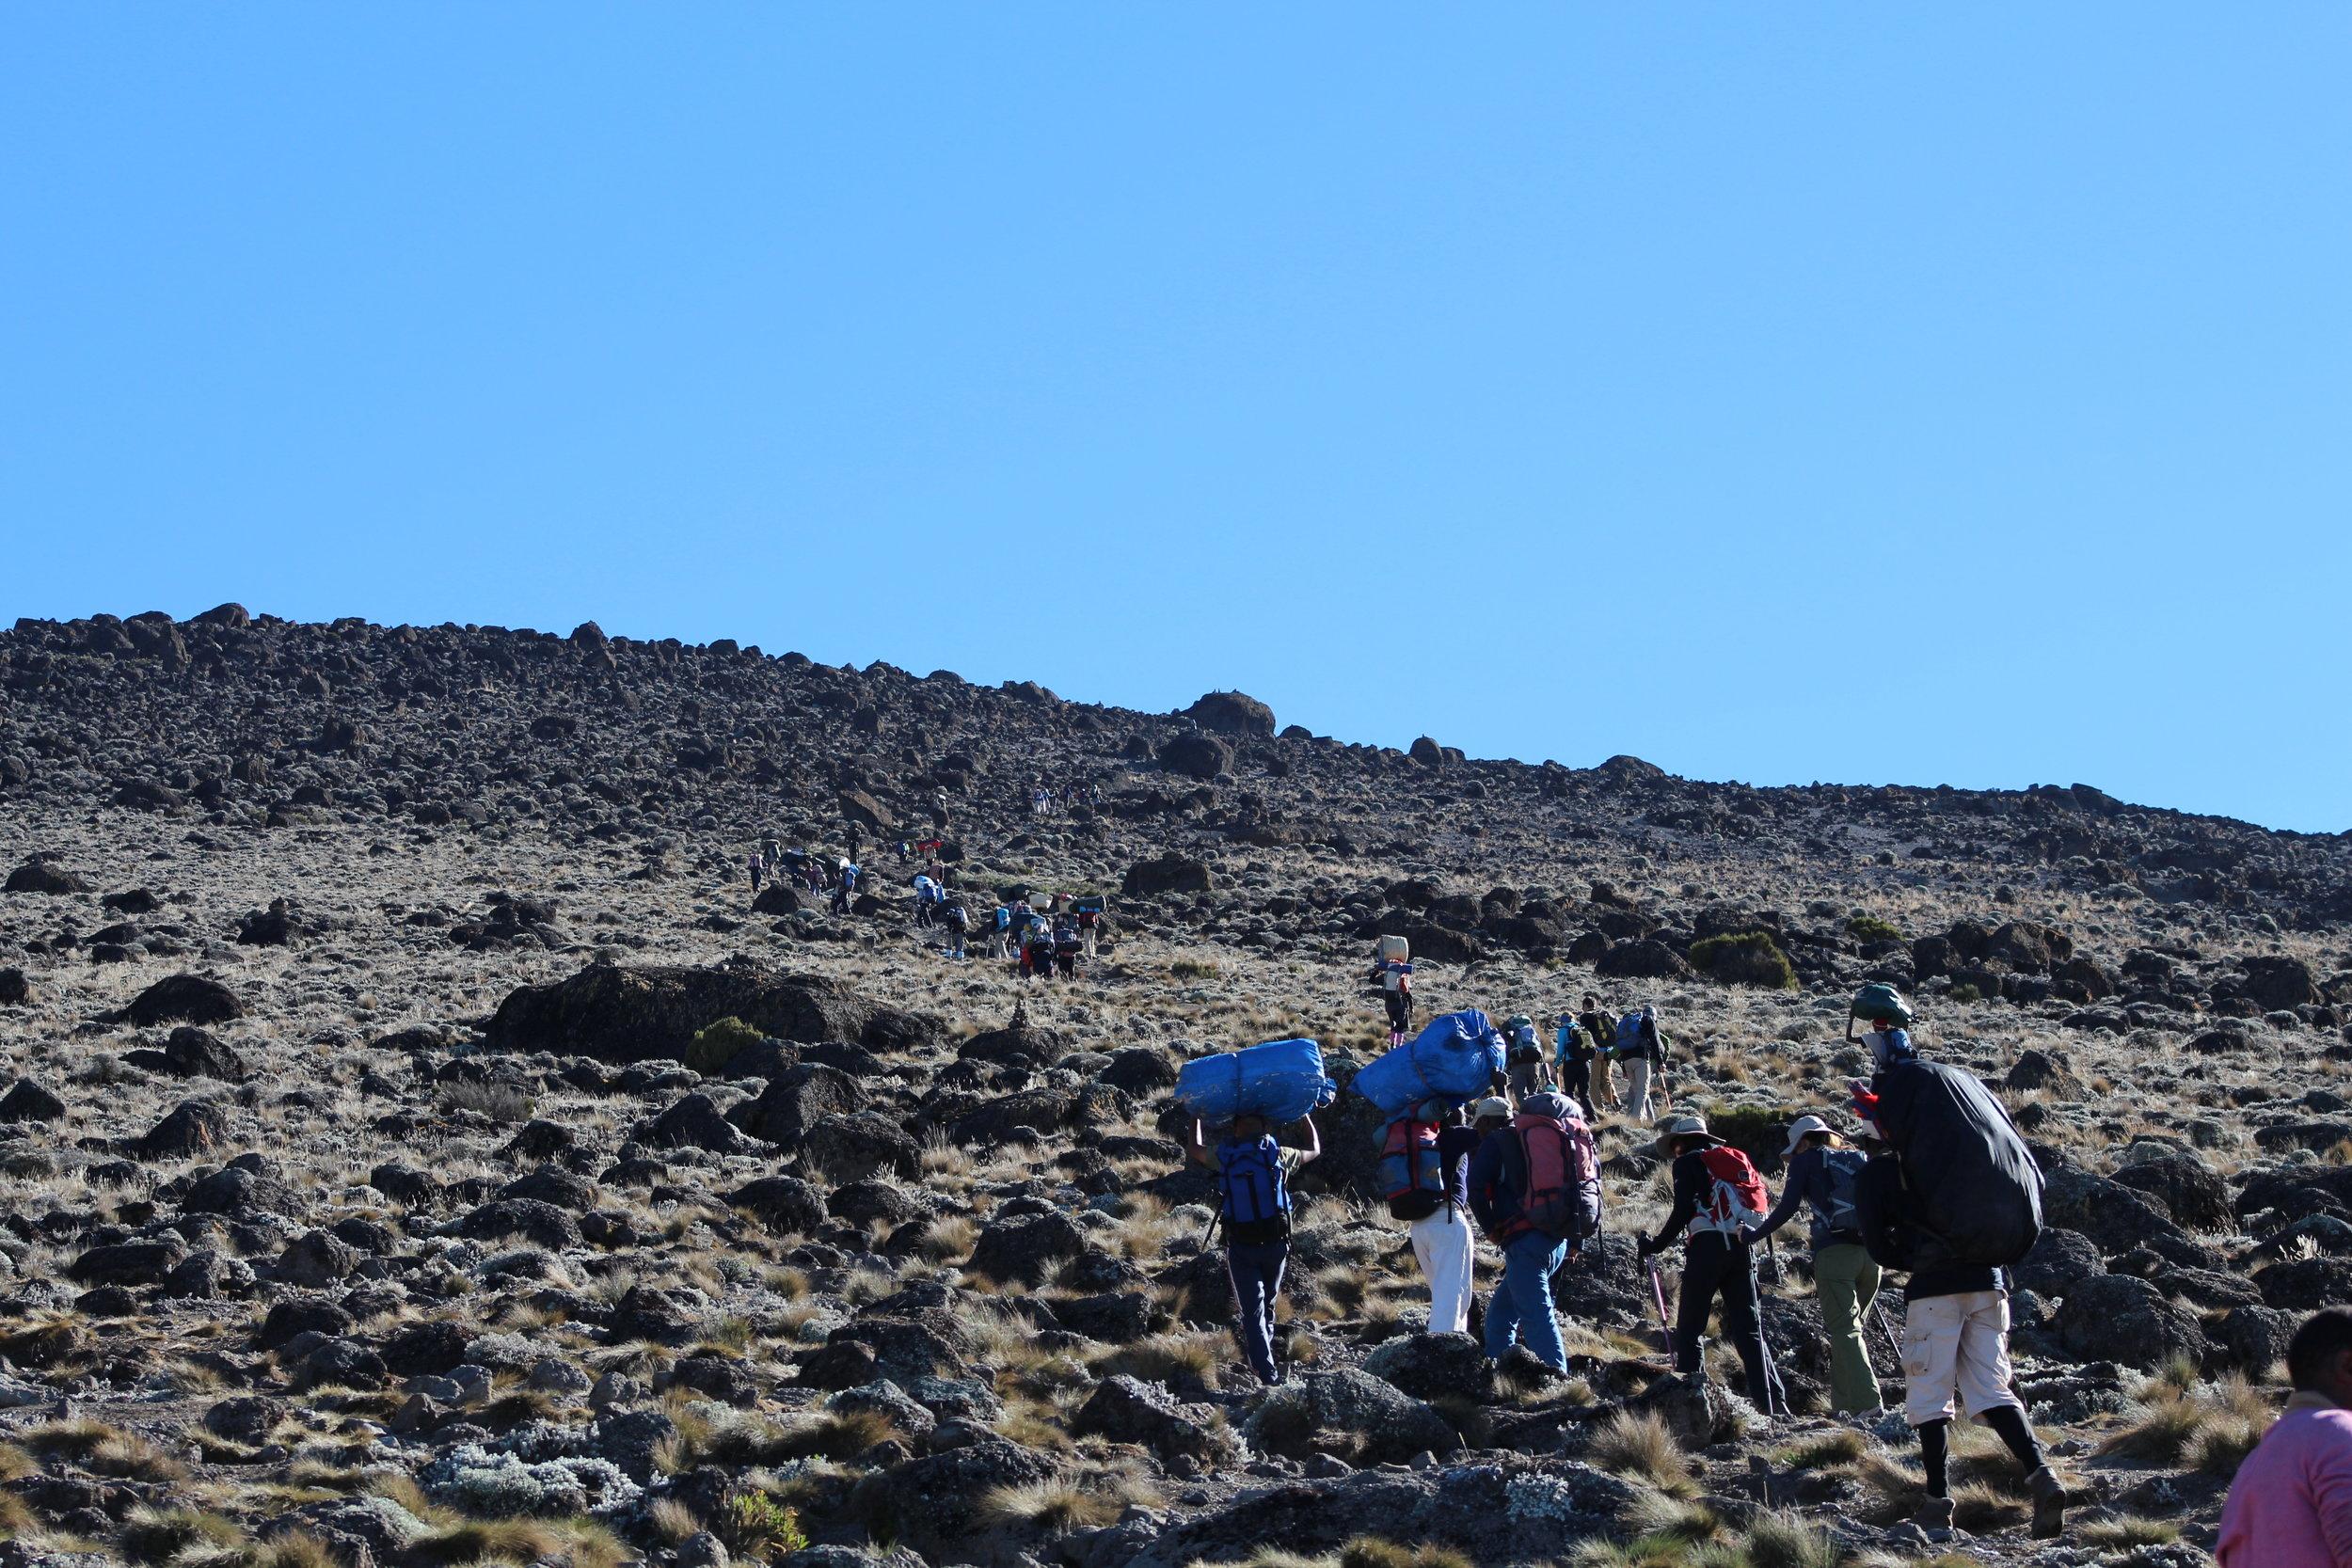 Porters leaving Karanga Valley Camp